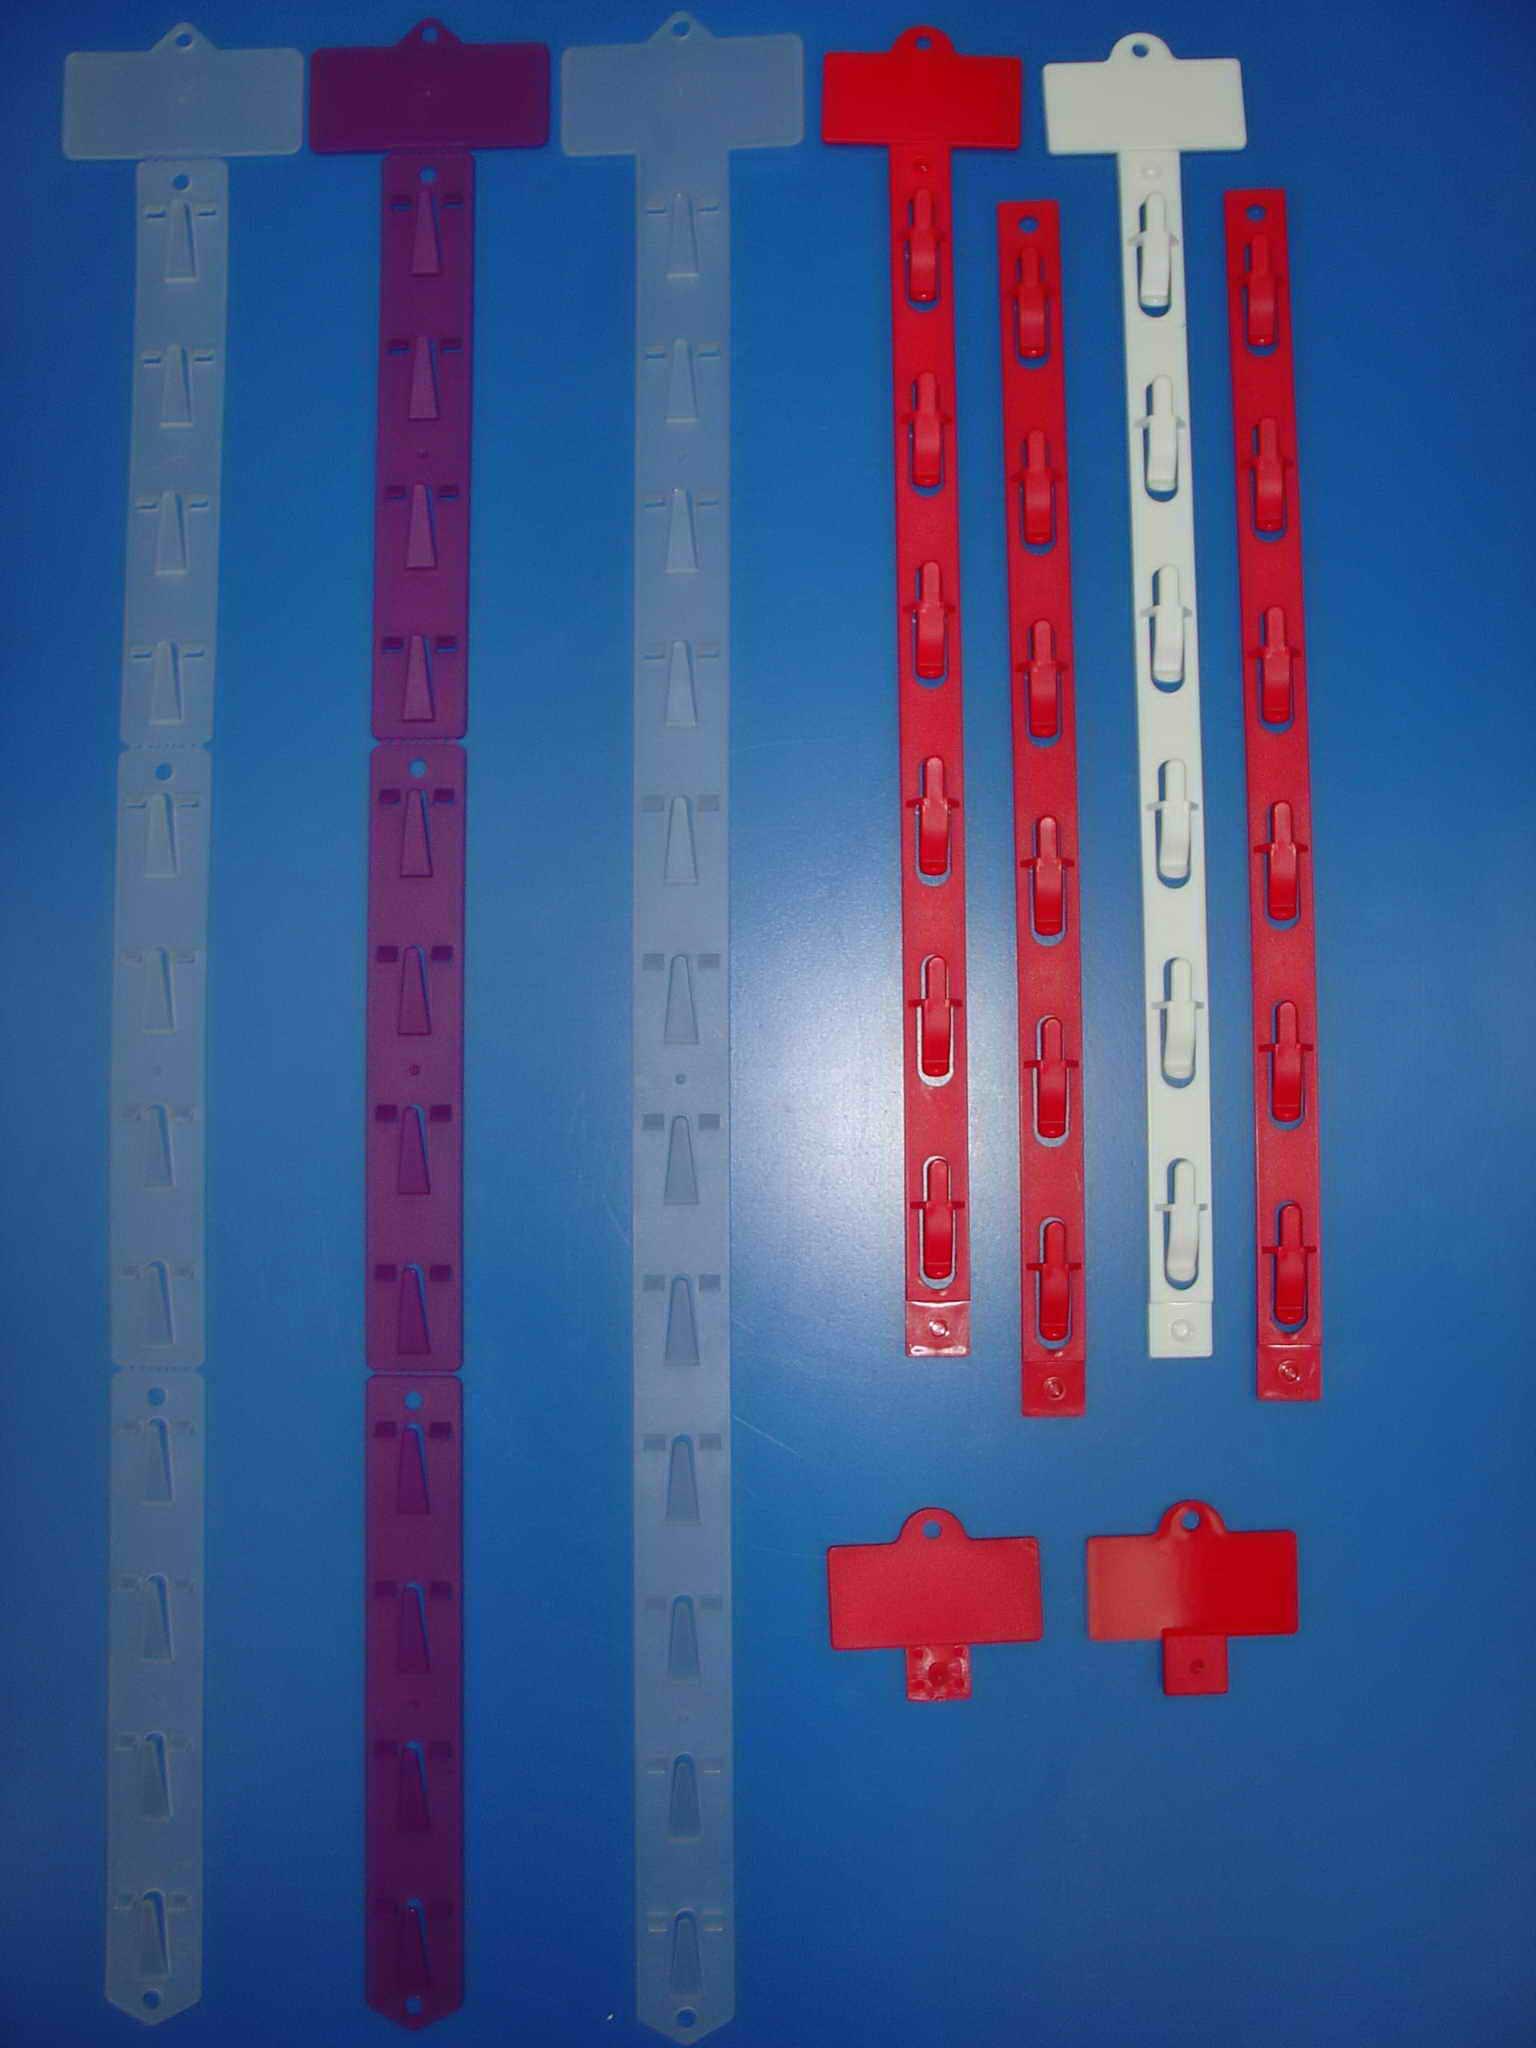 Welcome To Uniplastic Co Ltd!clips Strips,hang Strips,molded Clip  Strips,molded Hang Strips,merchandising Clip Strips,metalic Clip  Strips,metal Hooks,hang